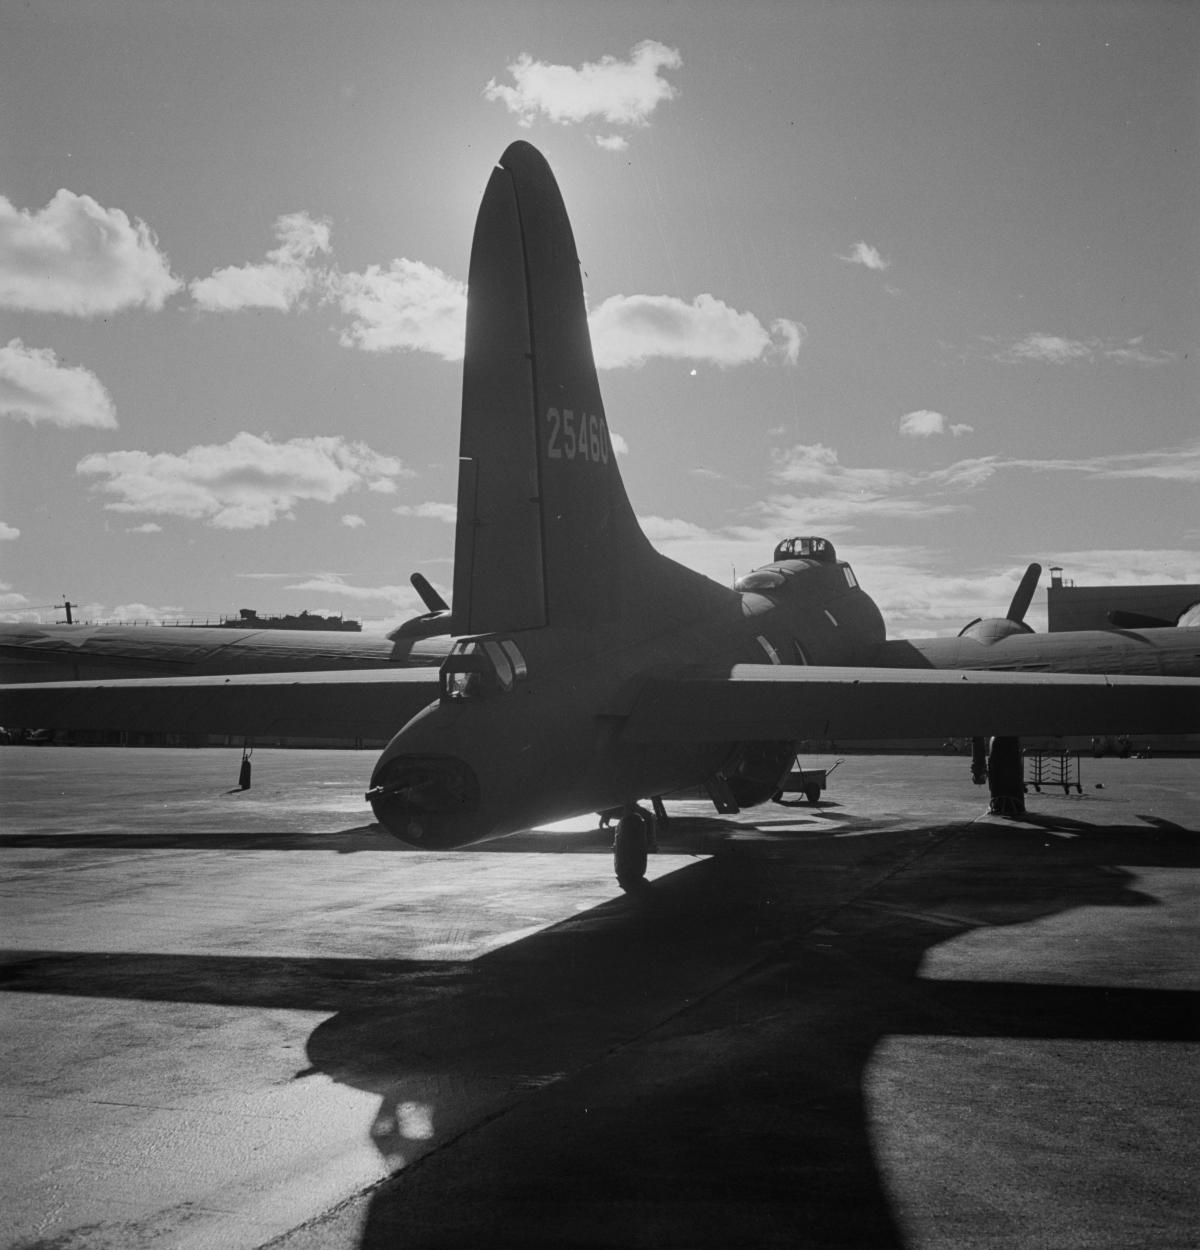 B-17 #42-5460